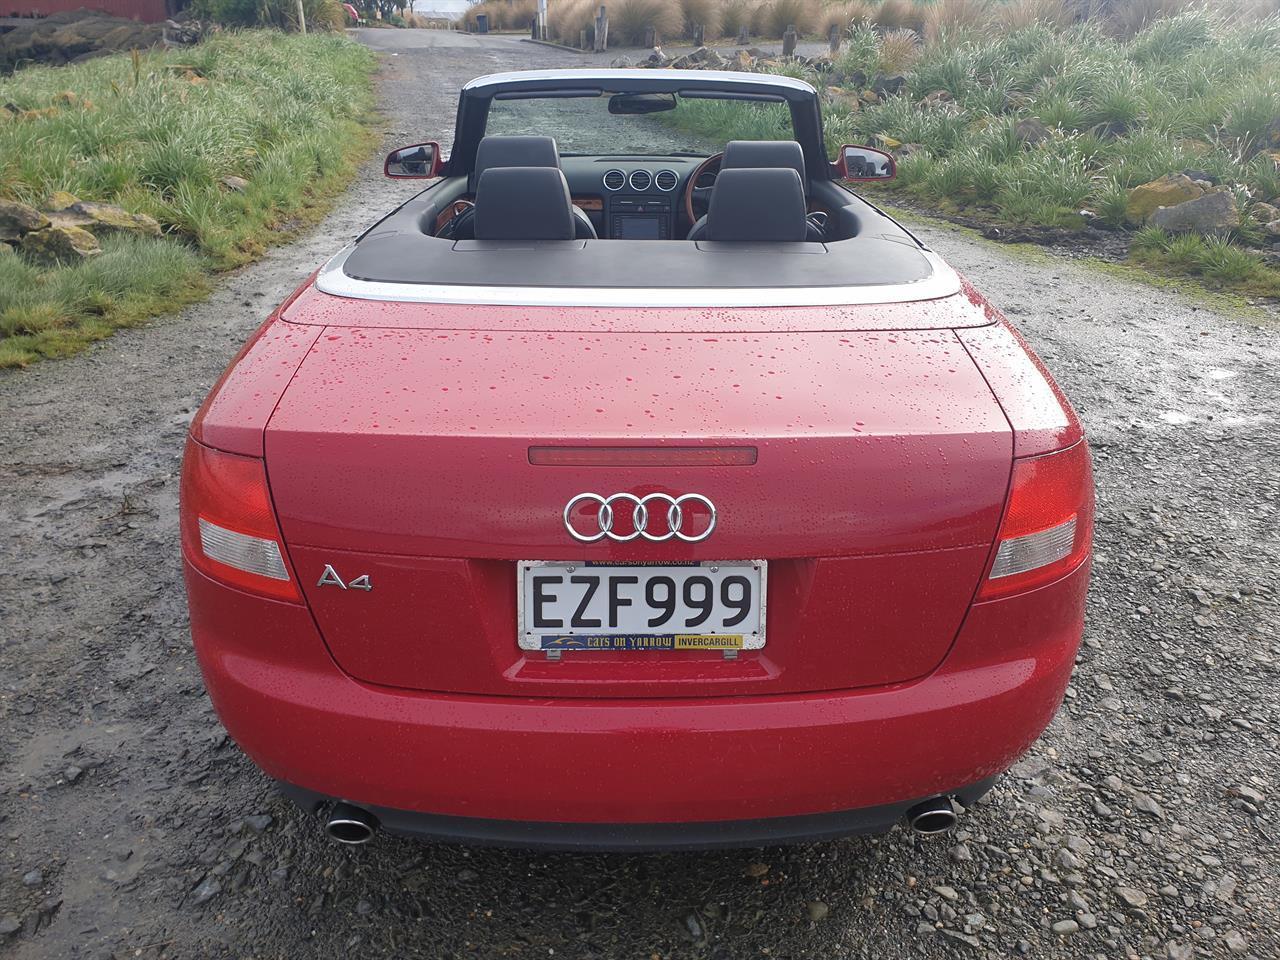 image-4, 2003 Audi A4 at Invercargill